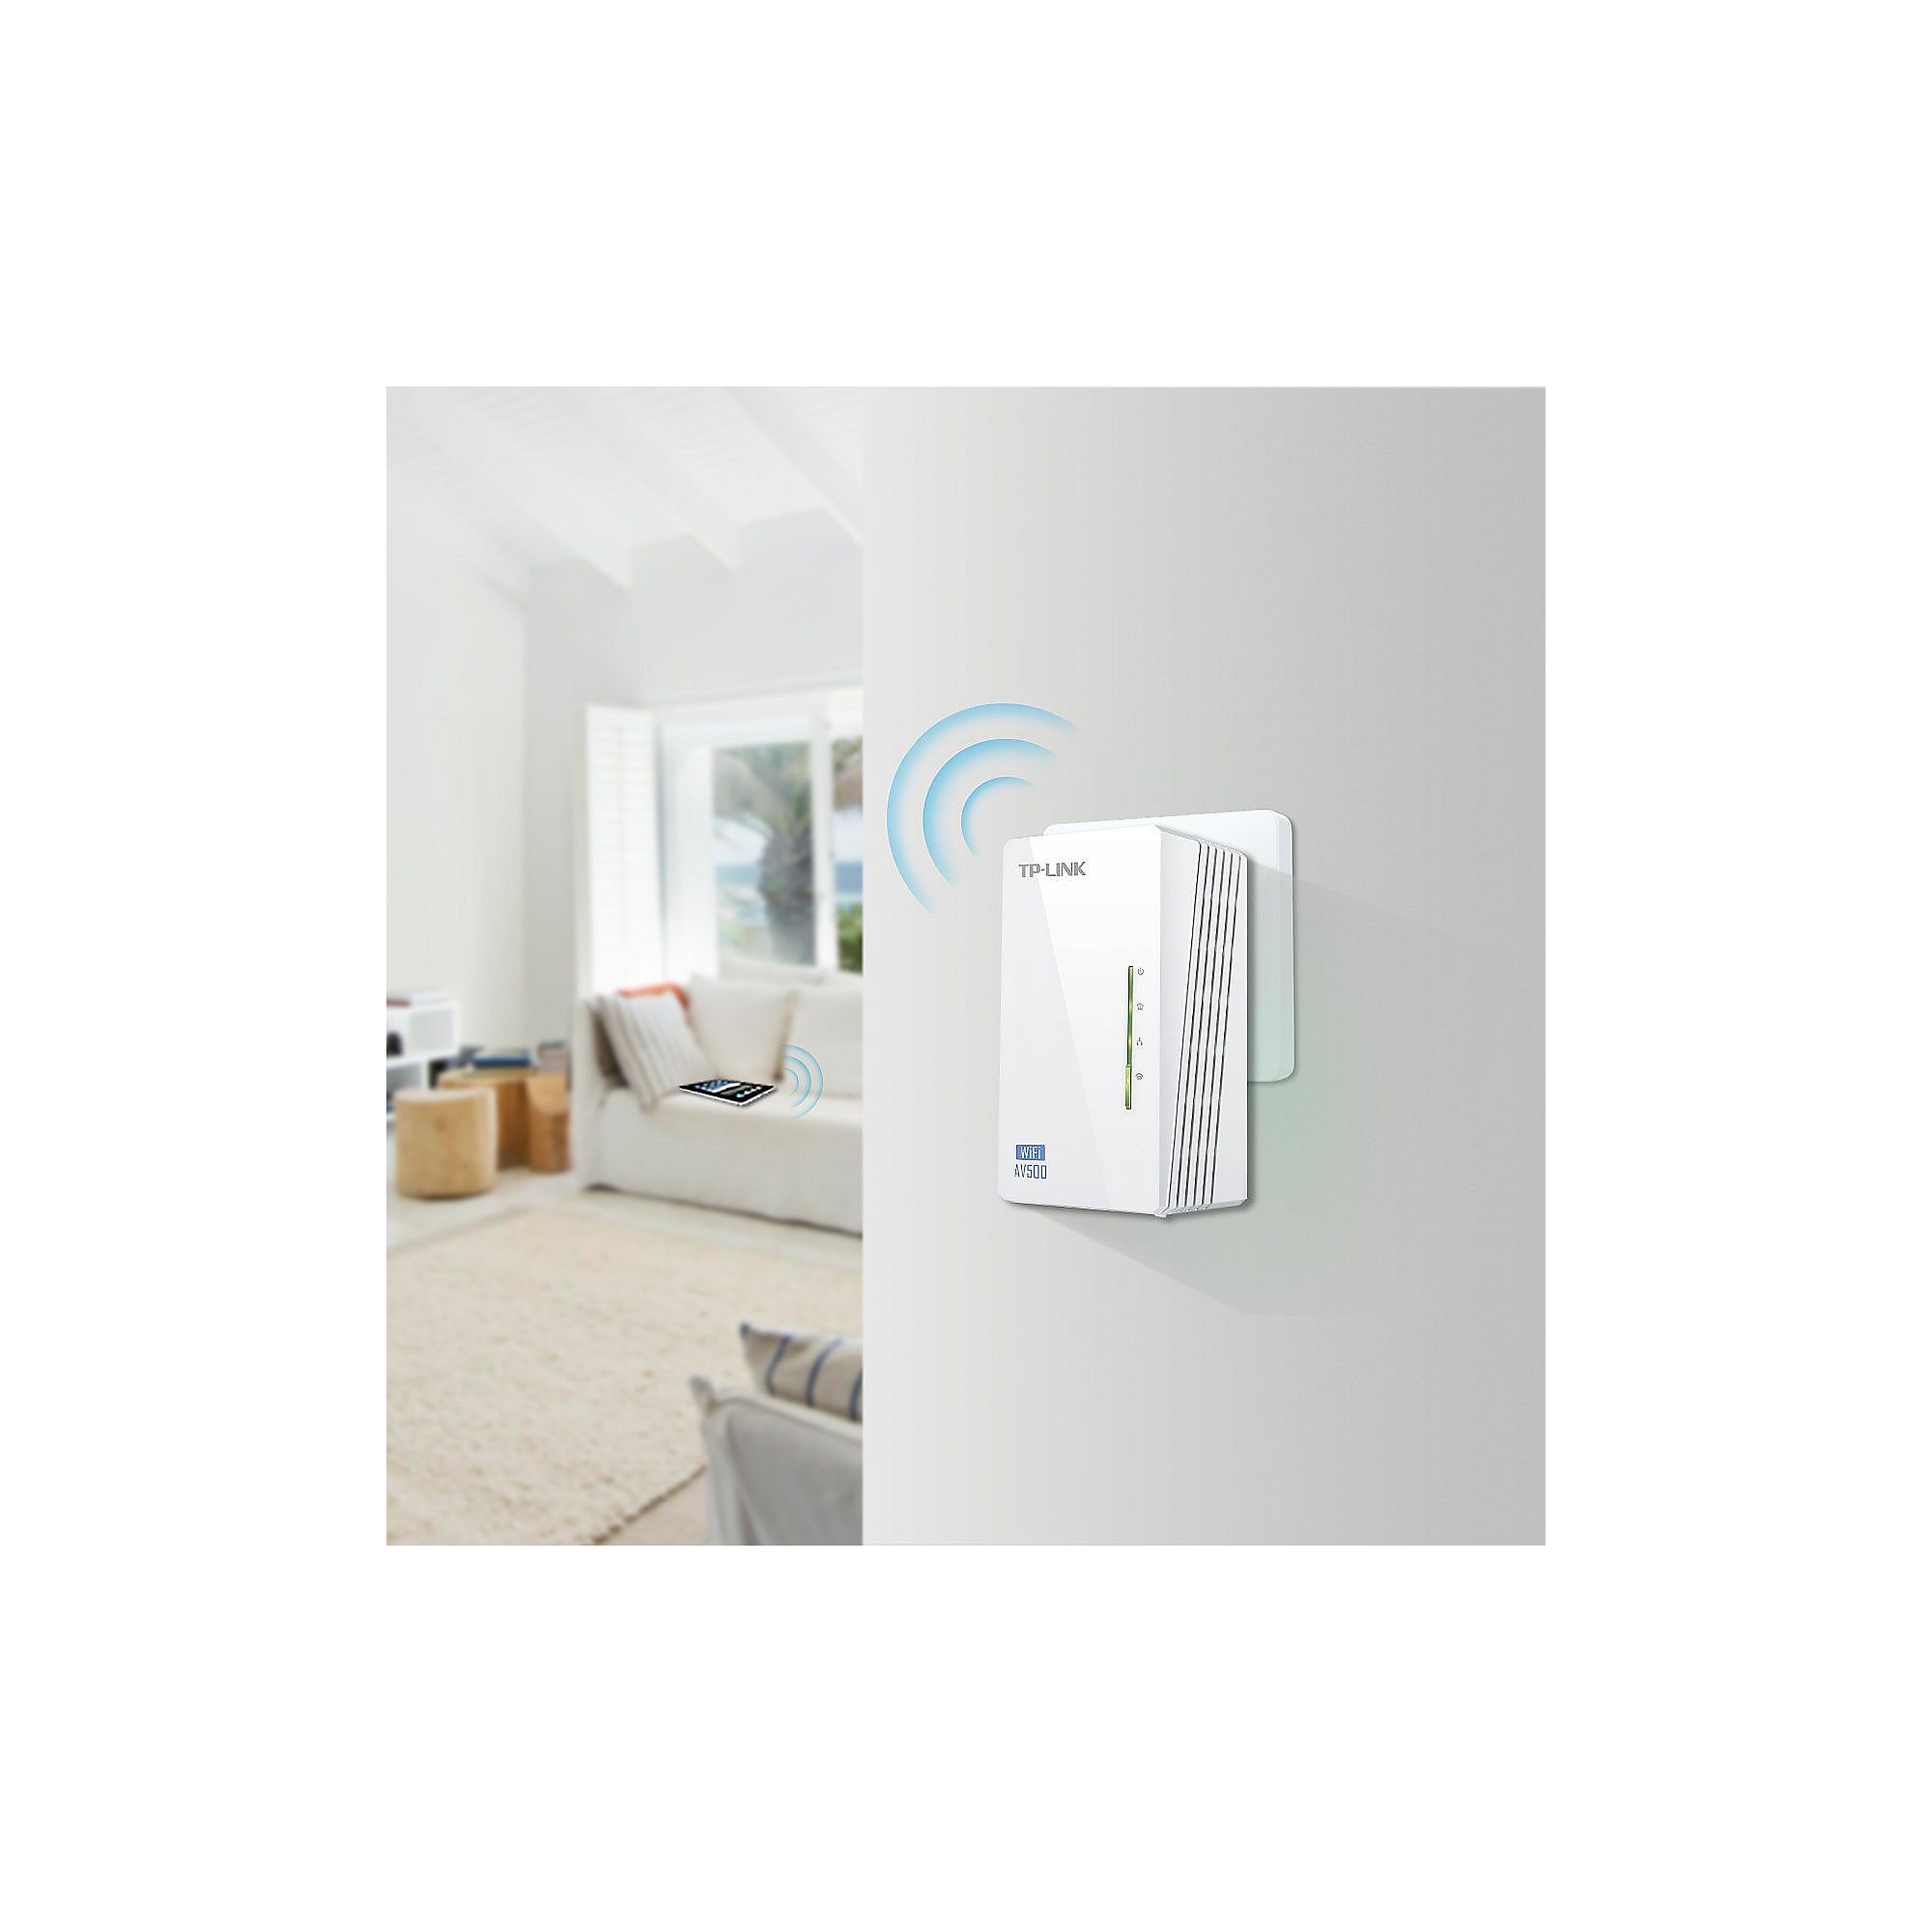 tp link av500 powerline adapter instructions